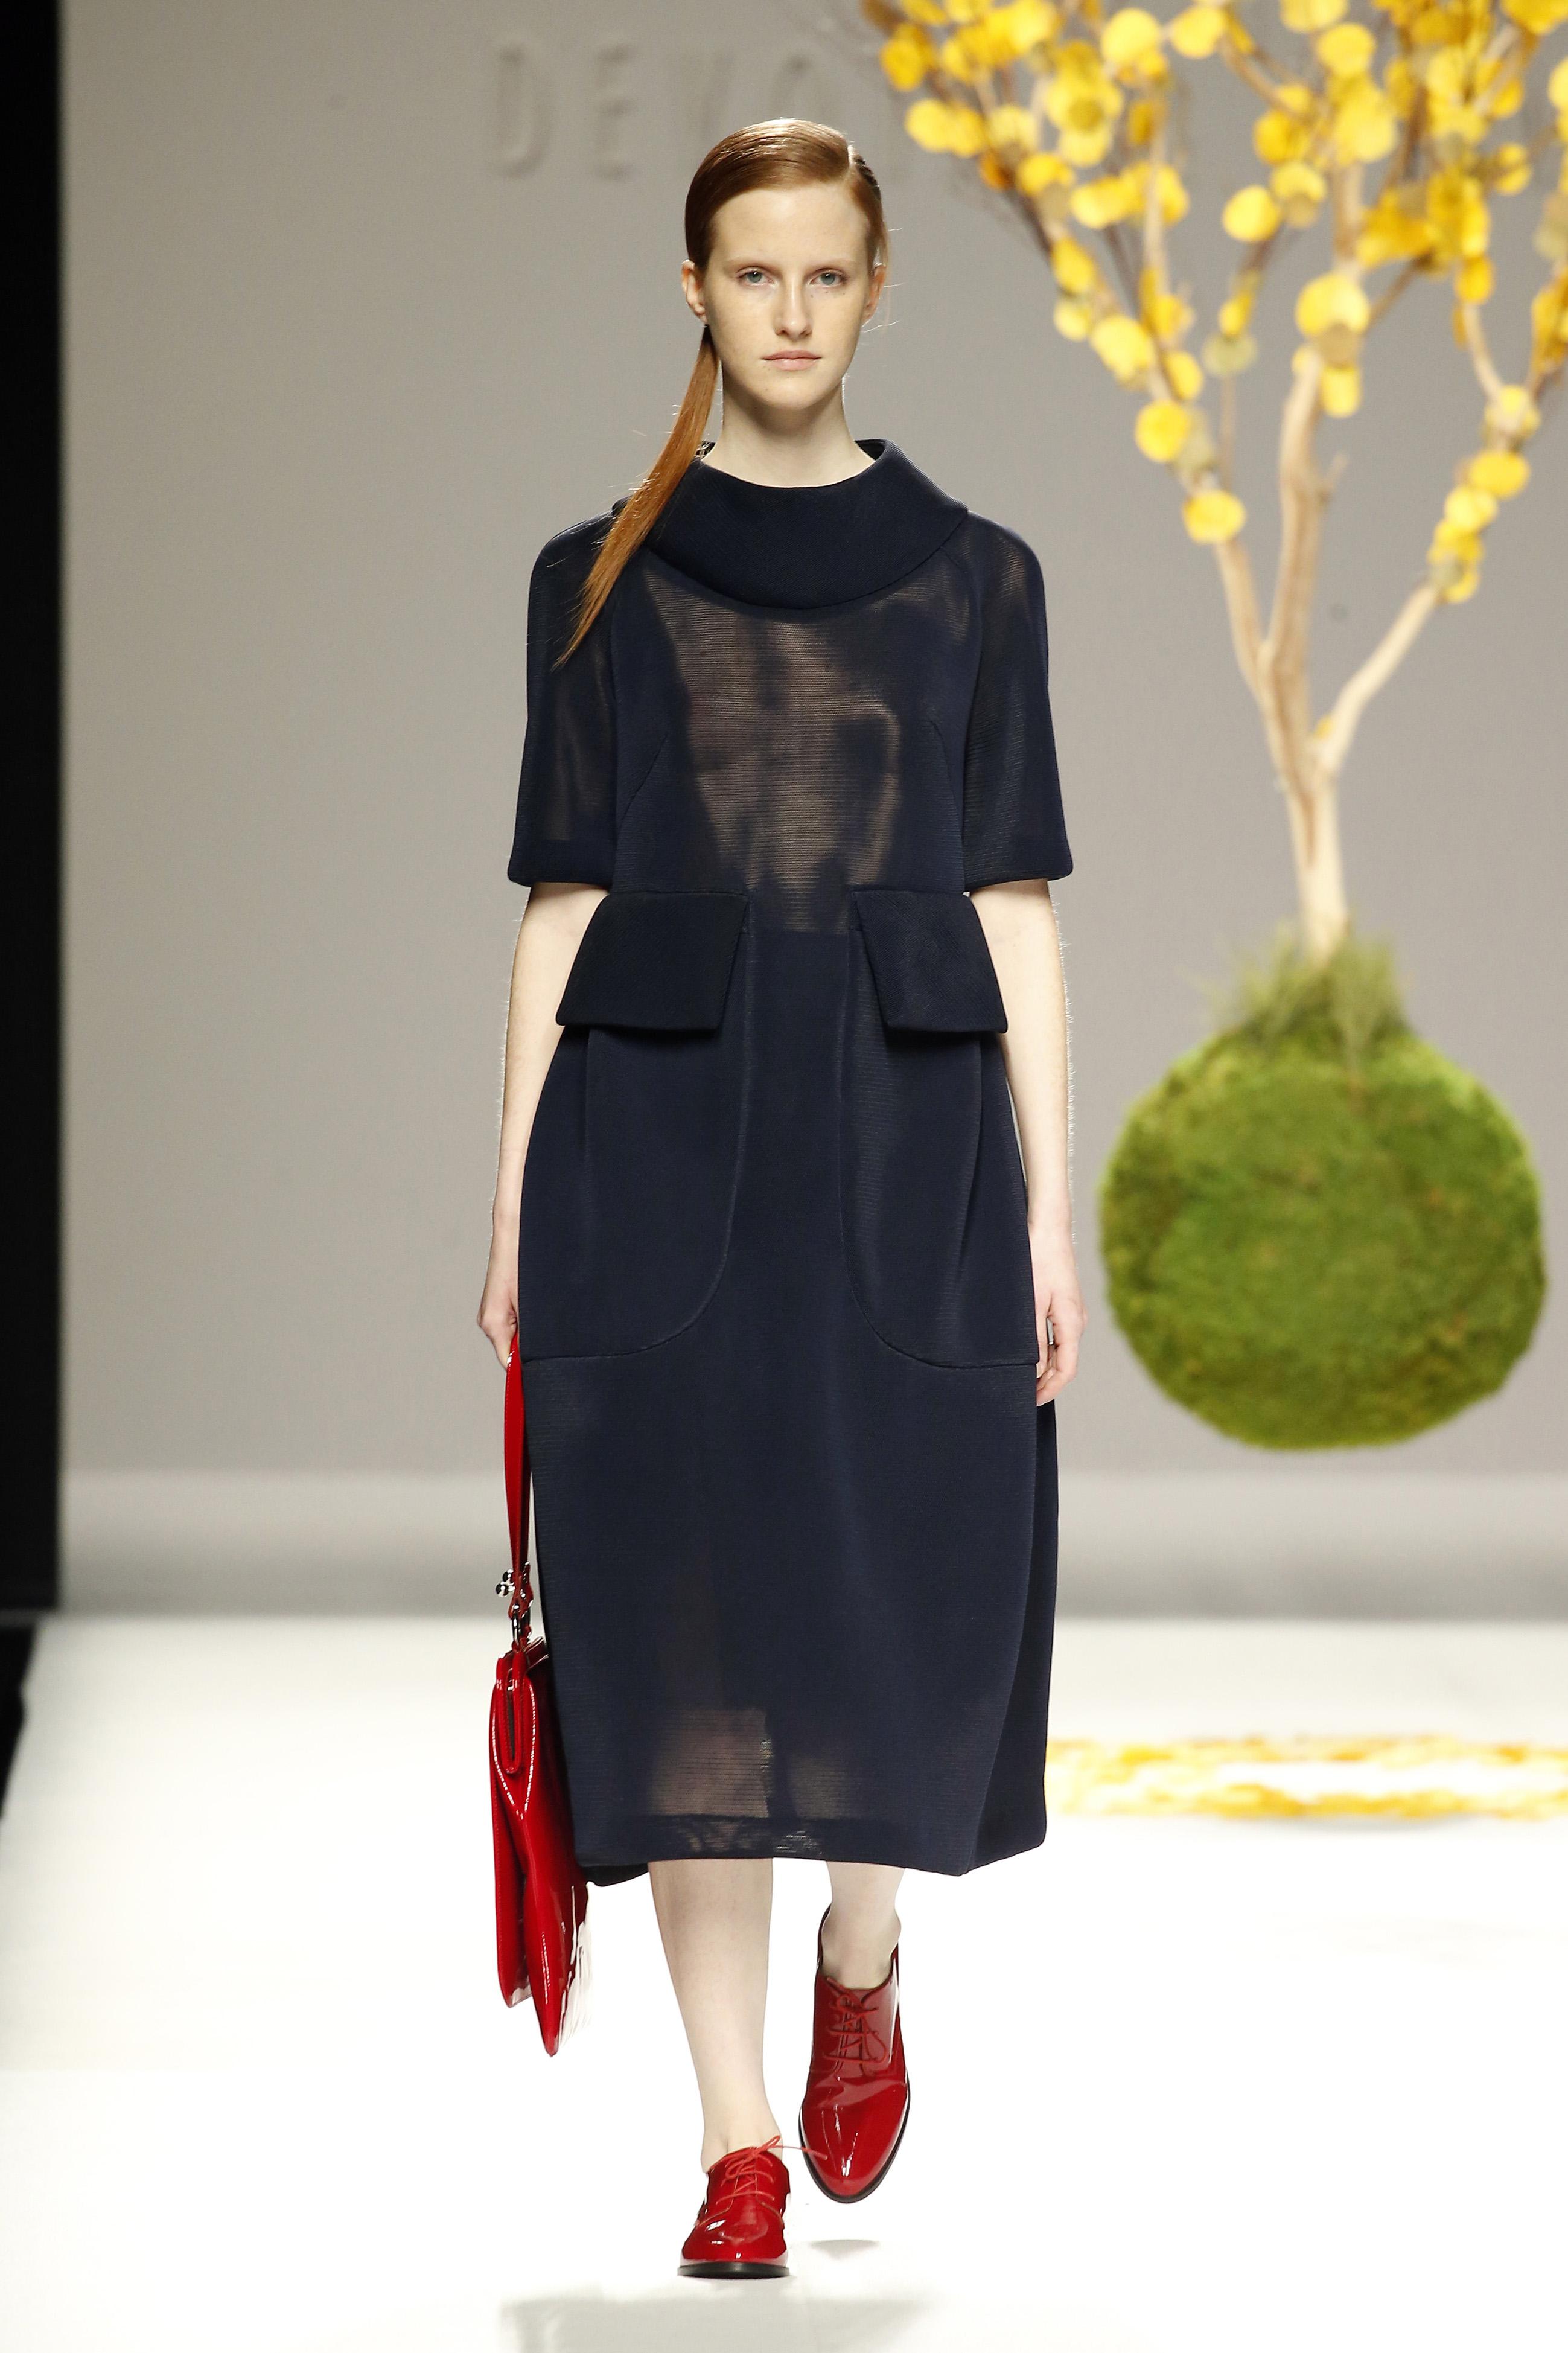 Vestido negro poliamida